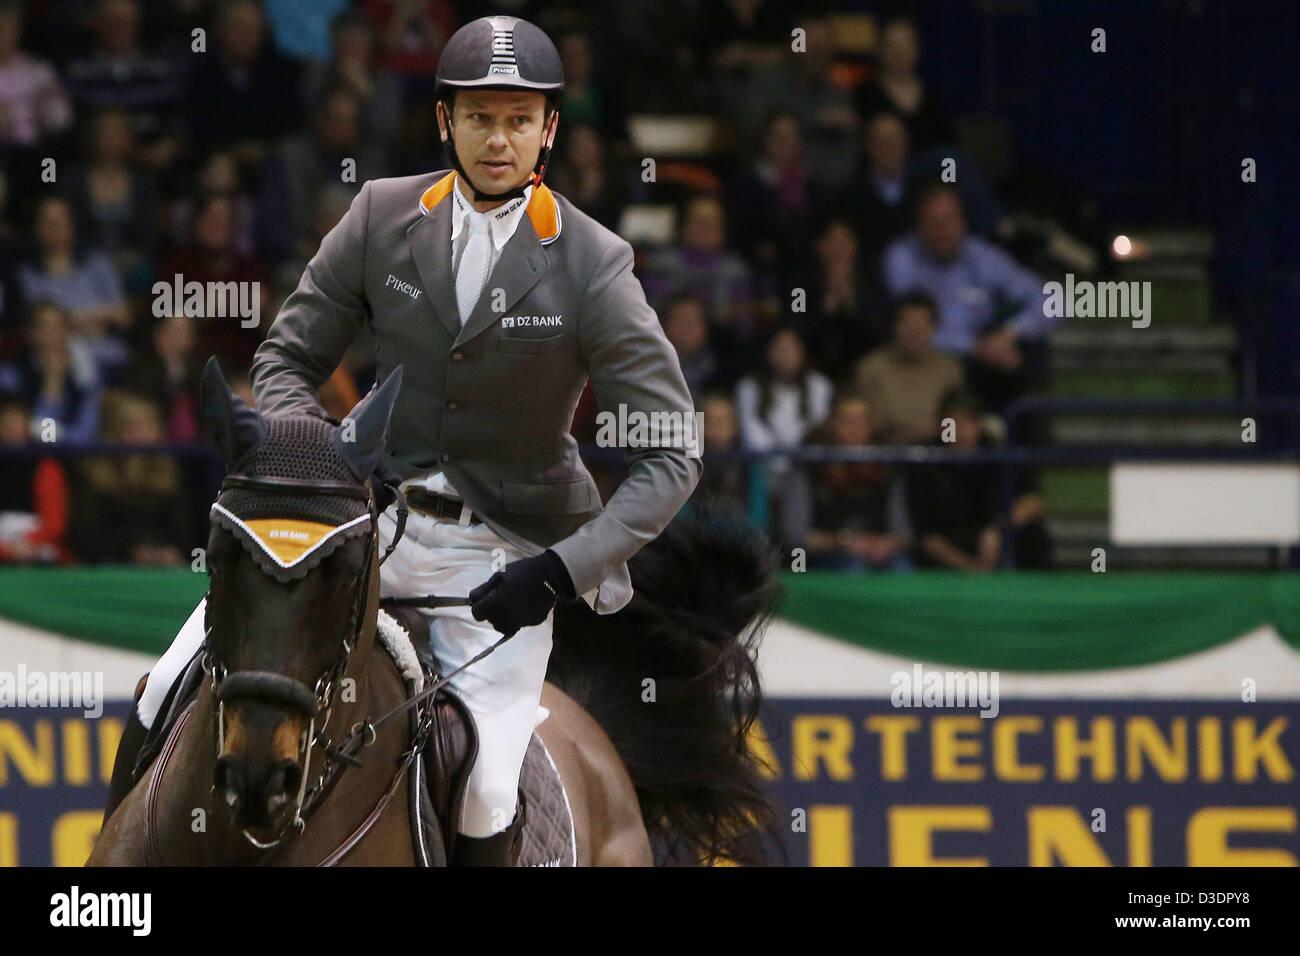 "German showjumper Marco Kutscher jumps on his horse ""Cornet's Cristallo"" during the internation showjumping Grand Stock Photo"